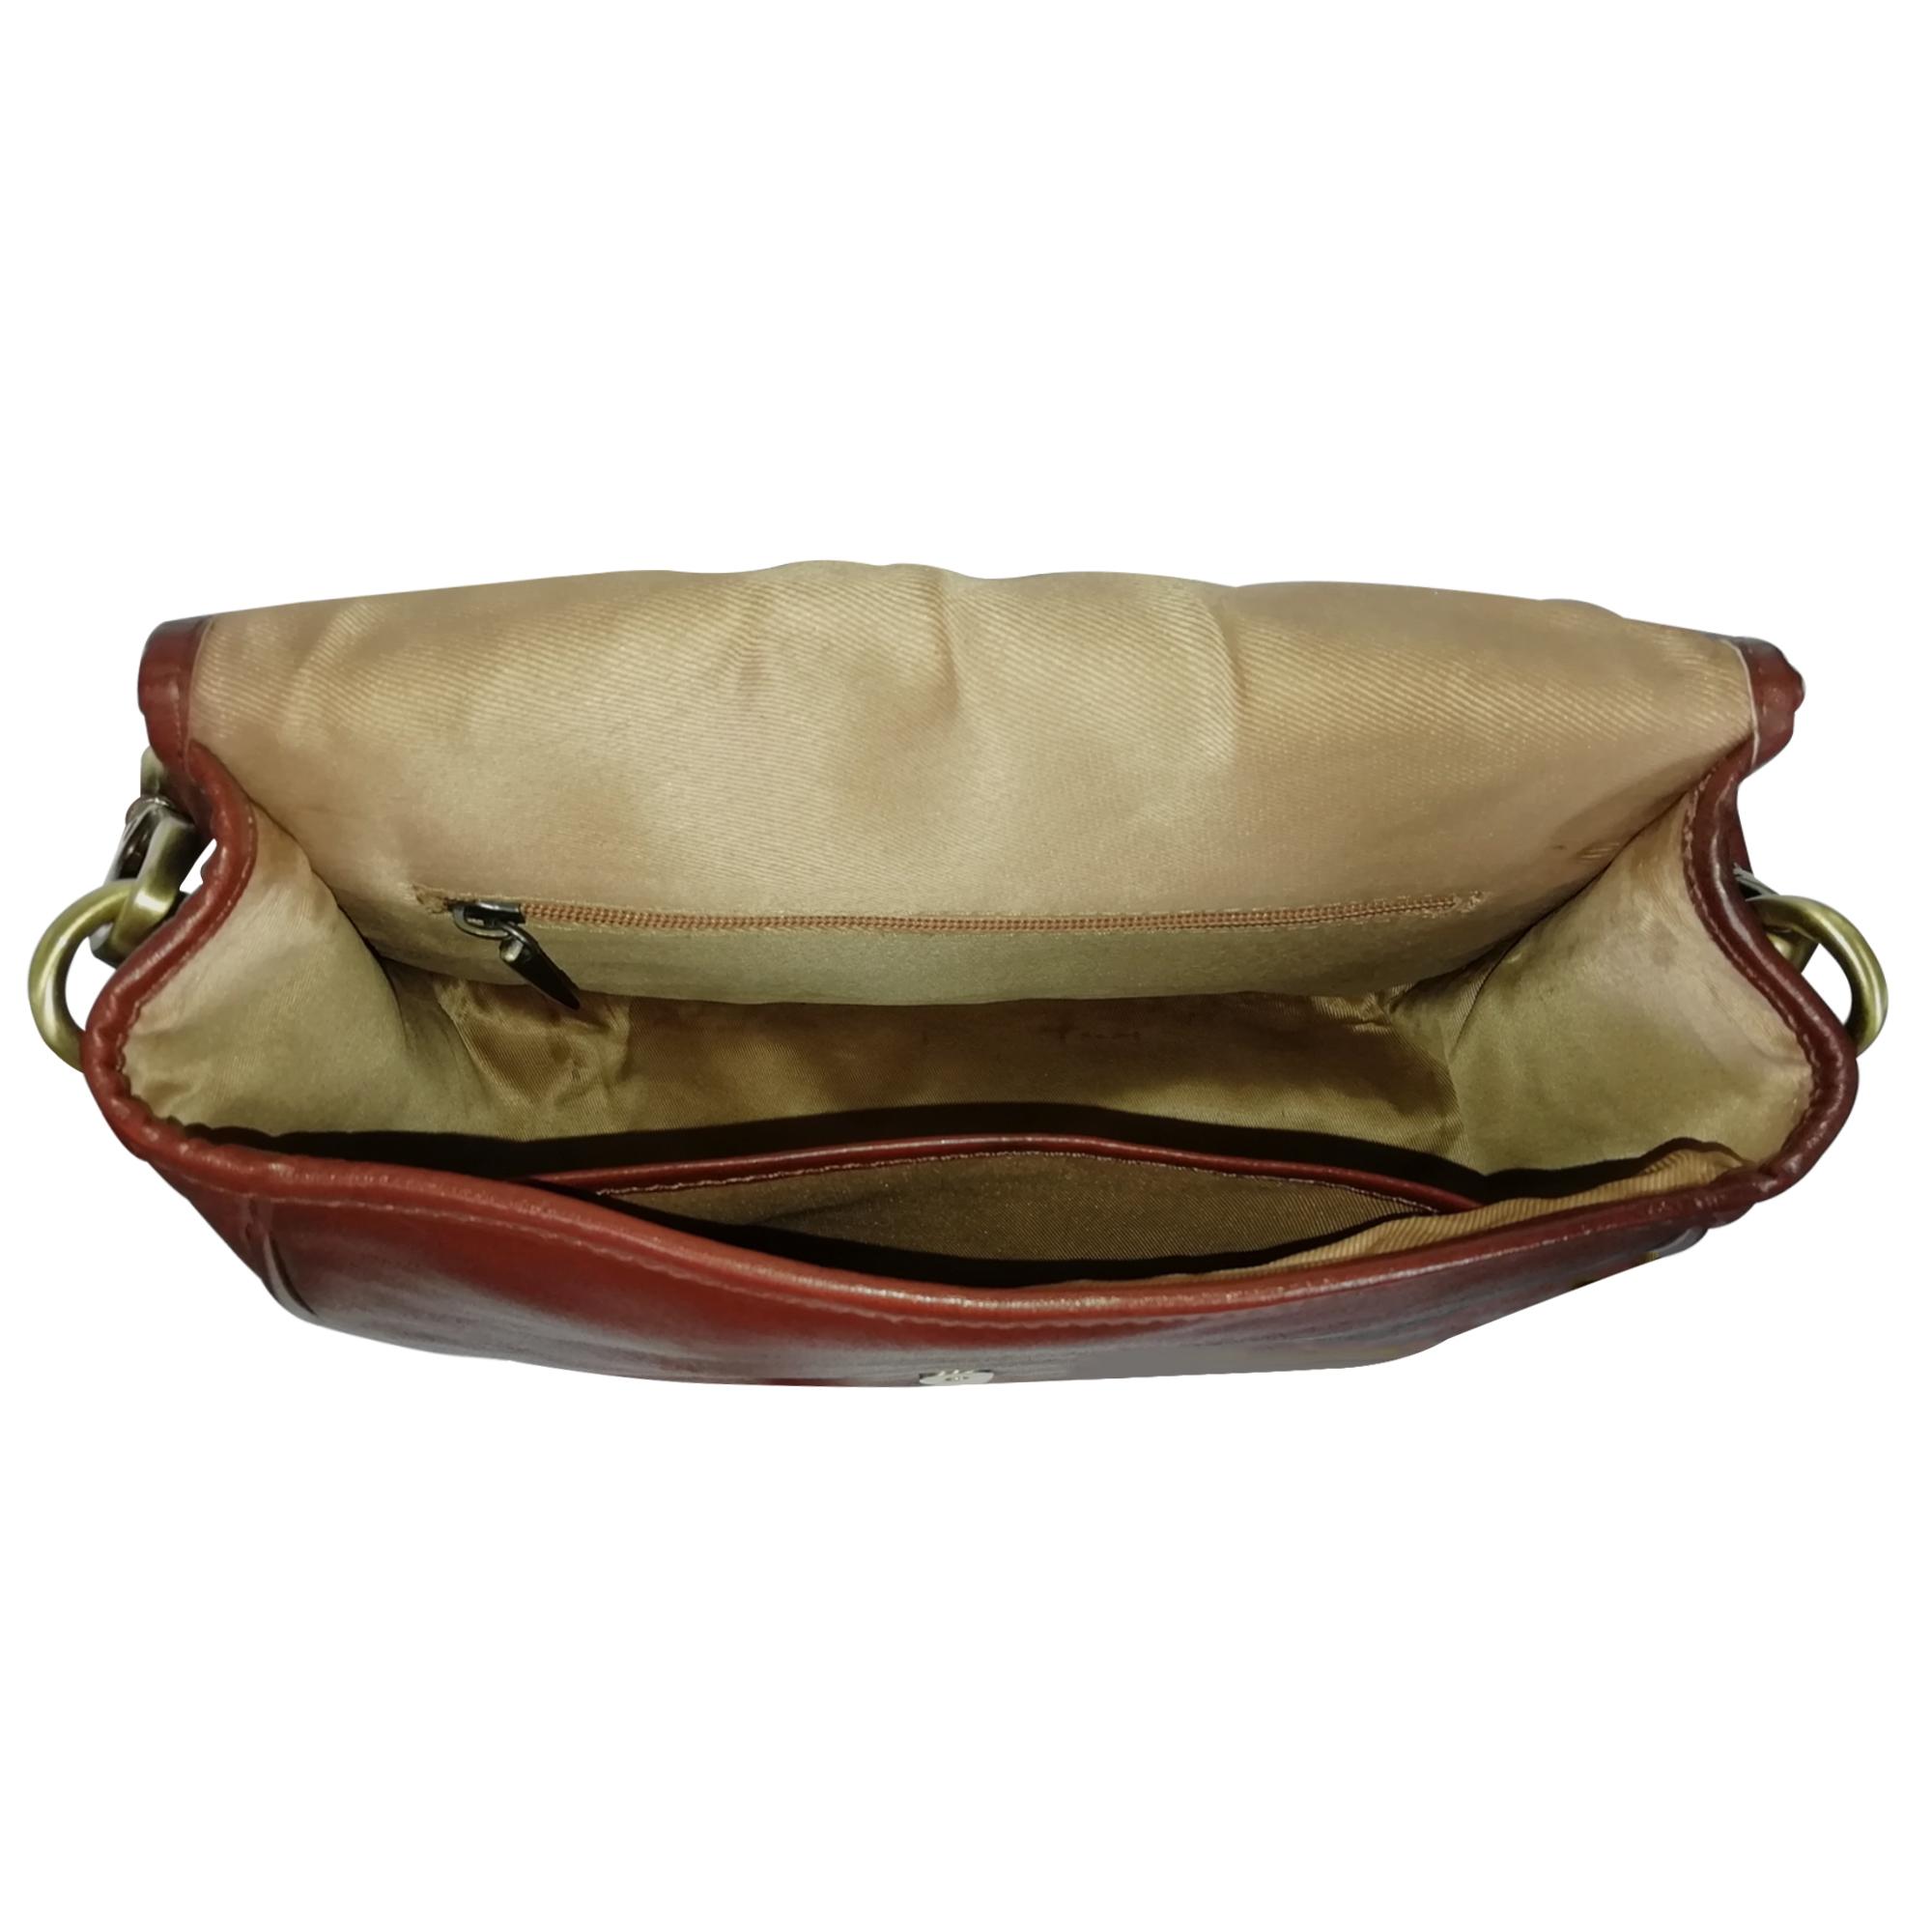 New Leather Sling Crossbody Handbag Women's Shoulder Office Bag